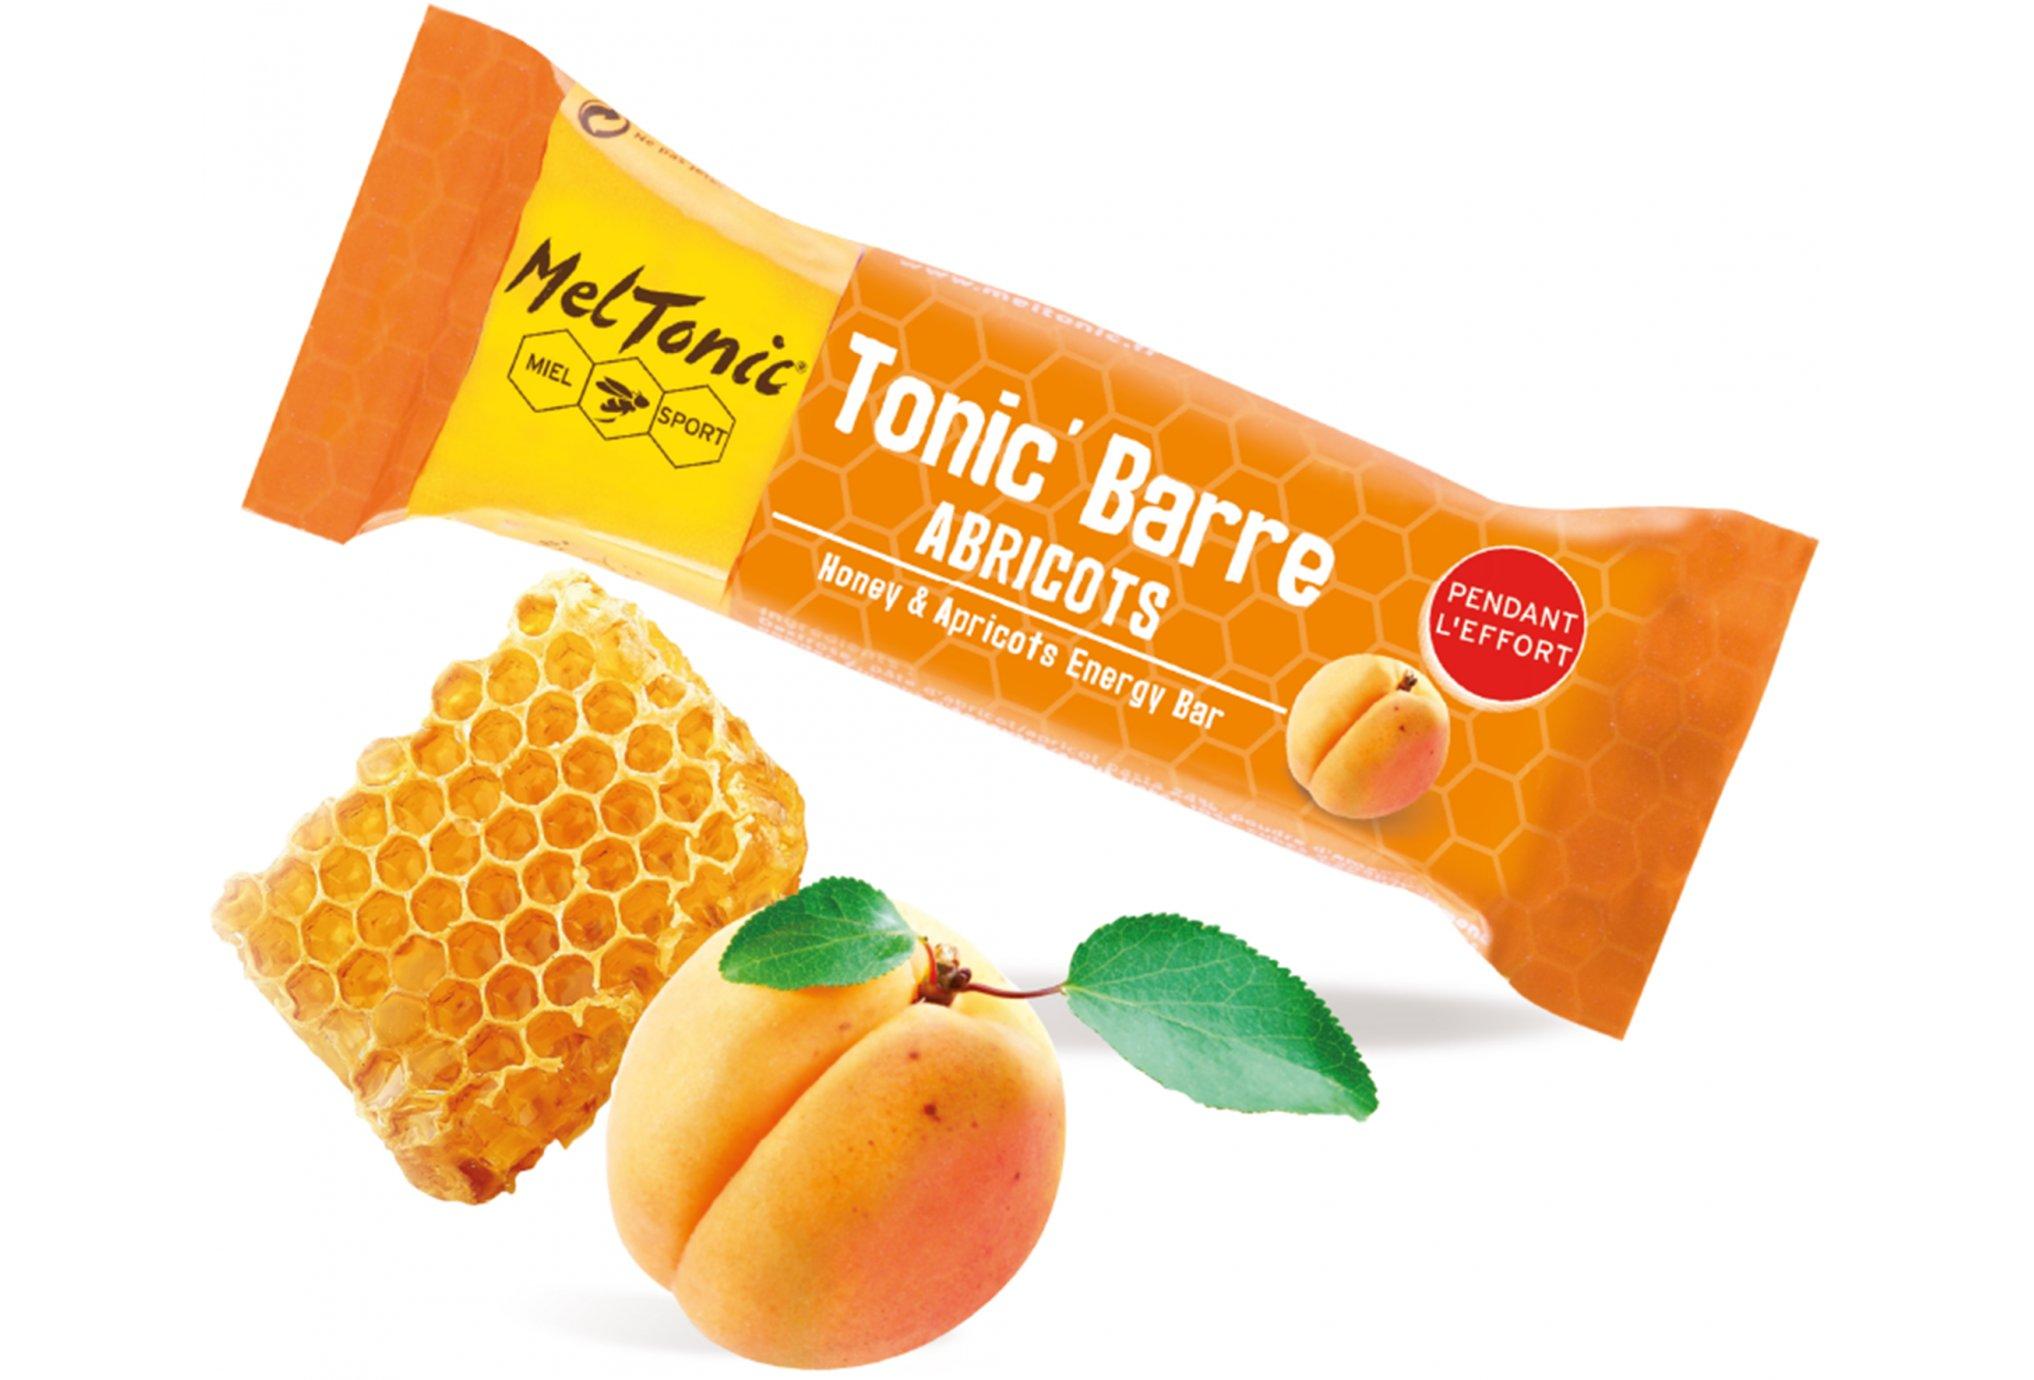 MelTonic Tonic'Barre - Albaricoque miel Diététique Barres